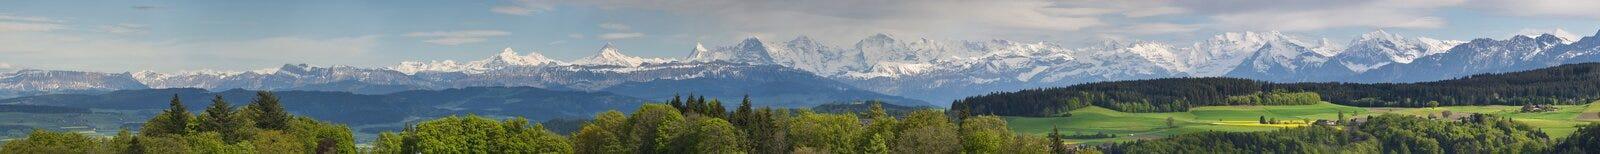 Panoramablick von Schweizer Alpen Lizenzfreies Stockbild